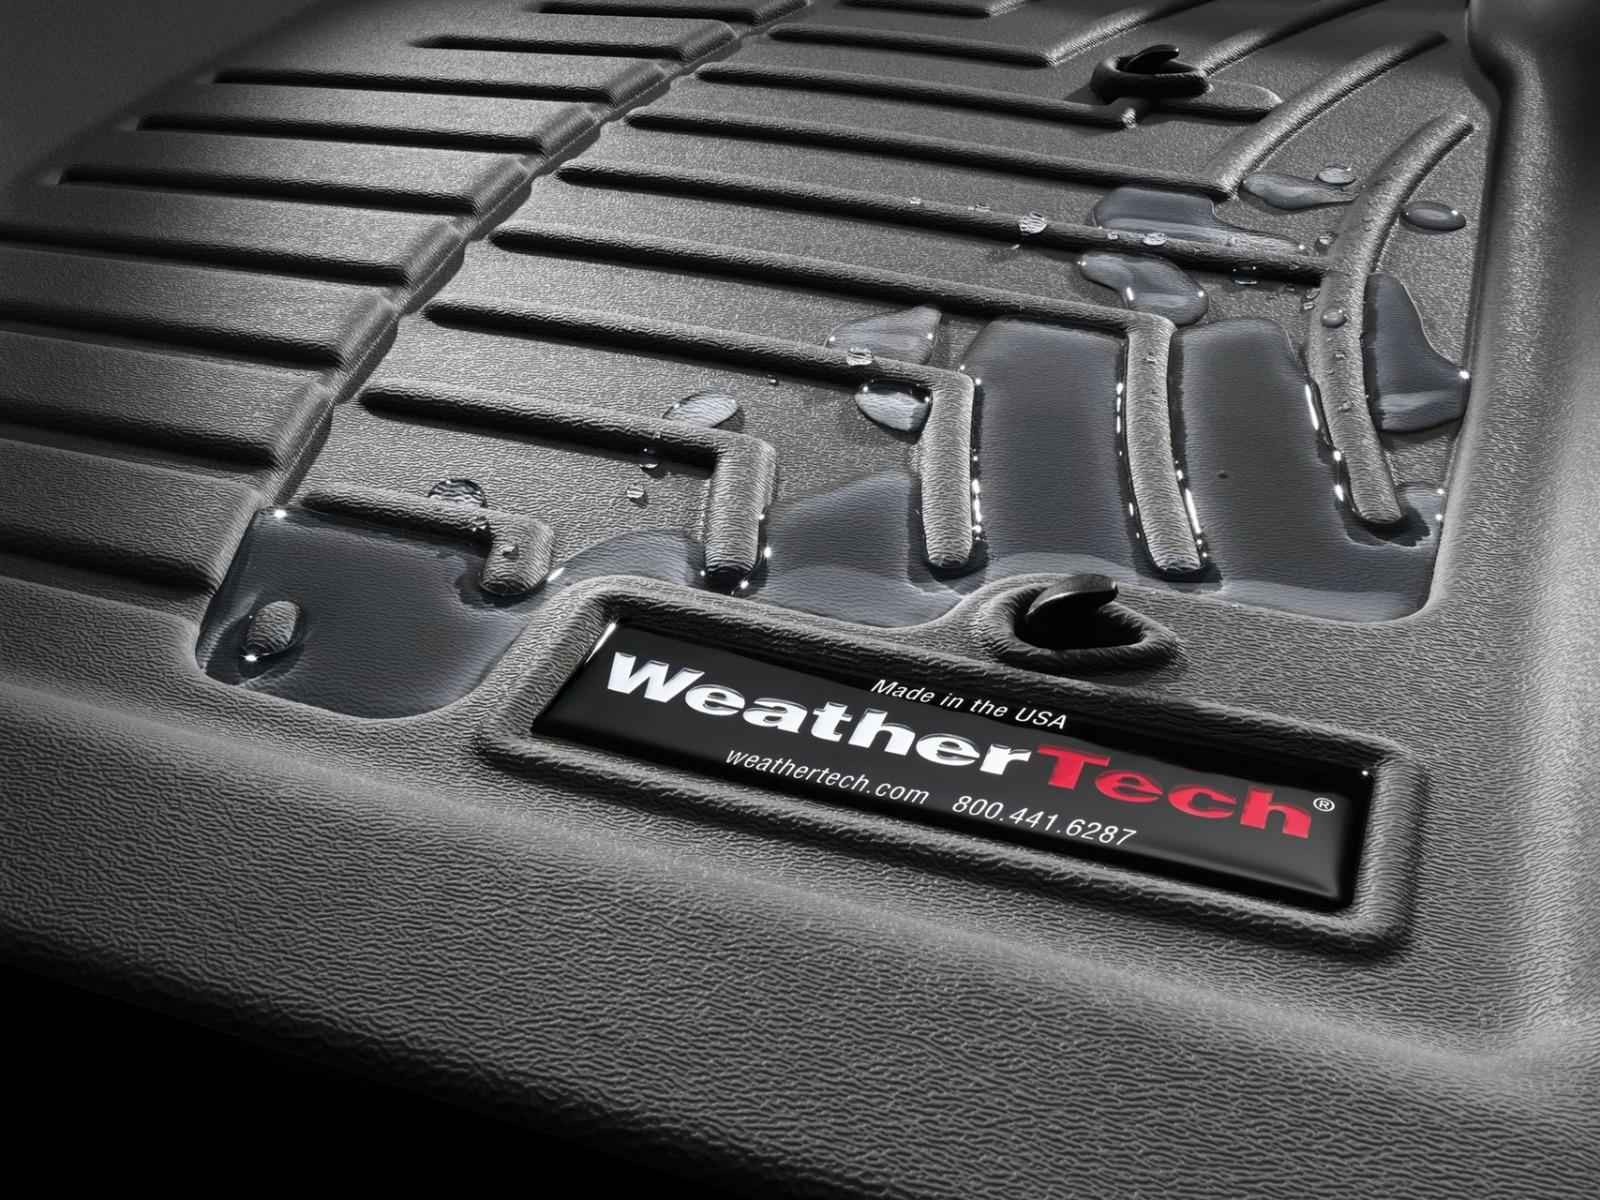 Weathertech floor mats bmw 328i - Weathertech Floor Mats Bmw 328i 55